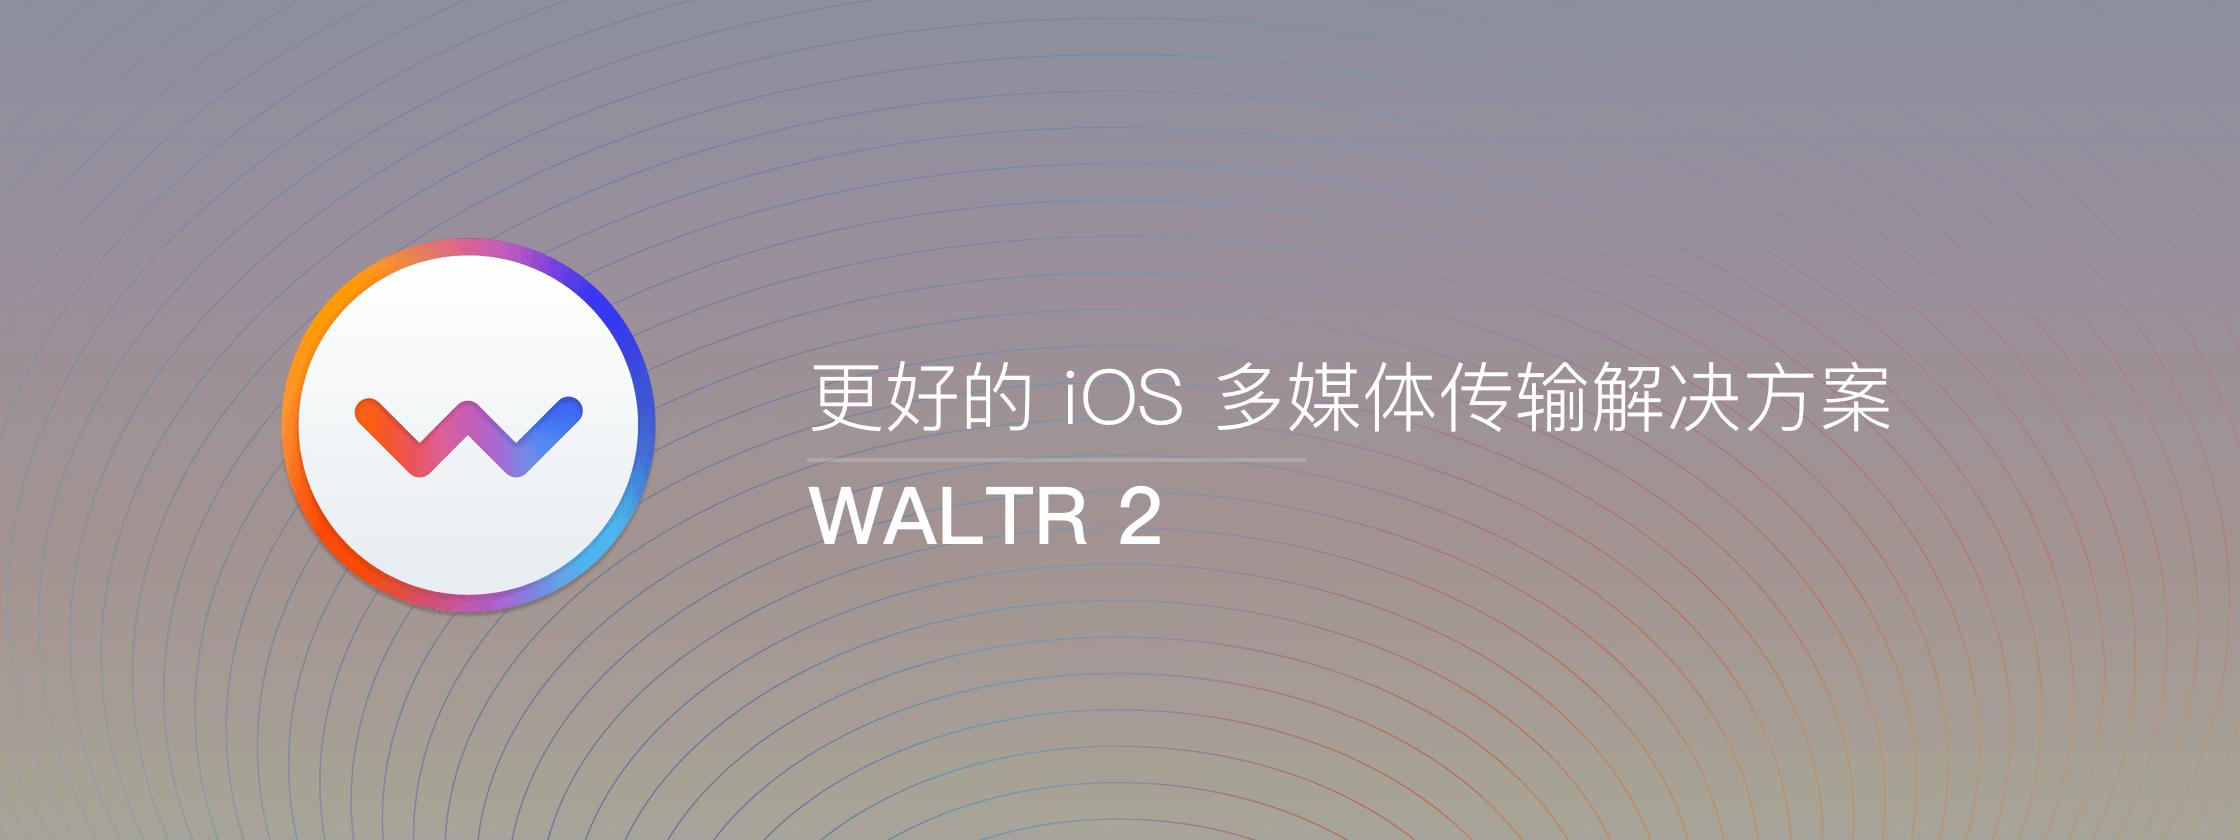 WALTR 2 –  更好的 iOS 多媒体传输解决方案